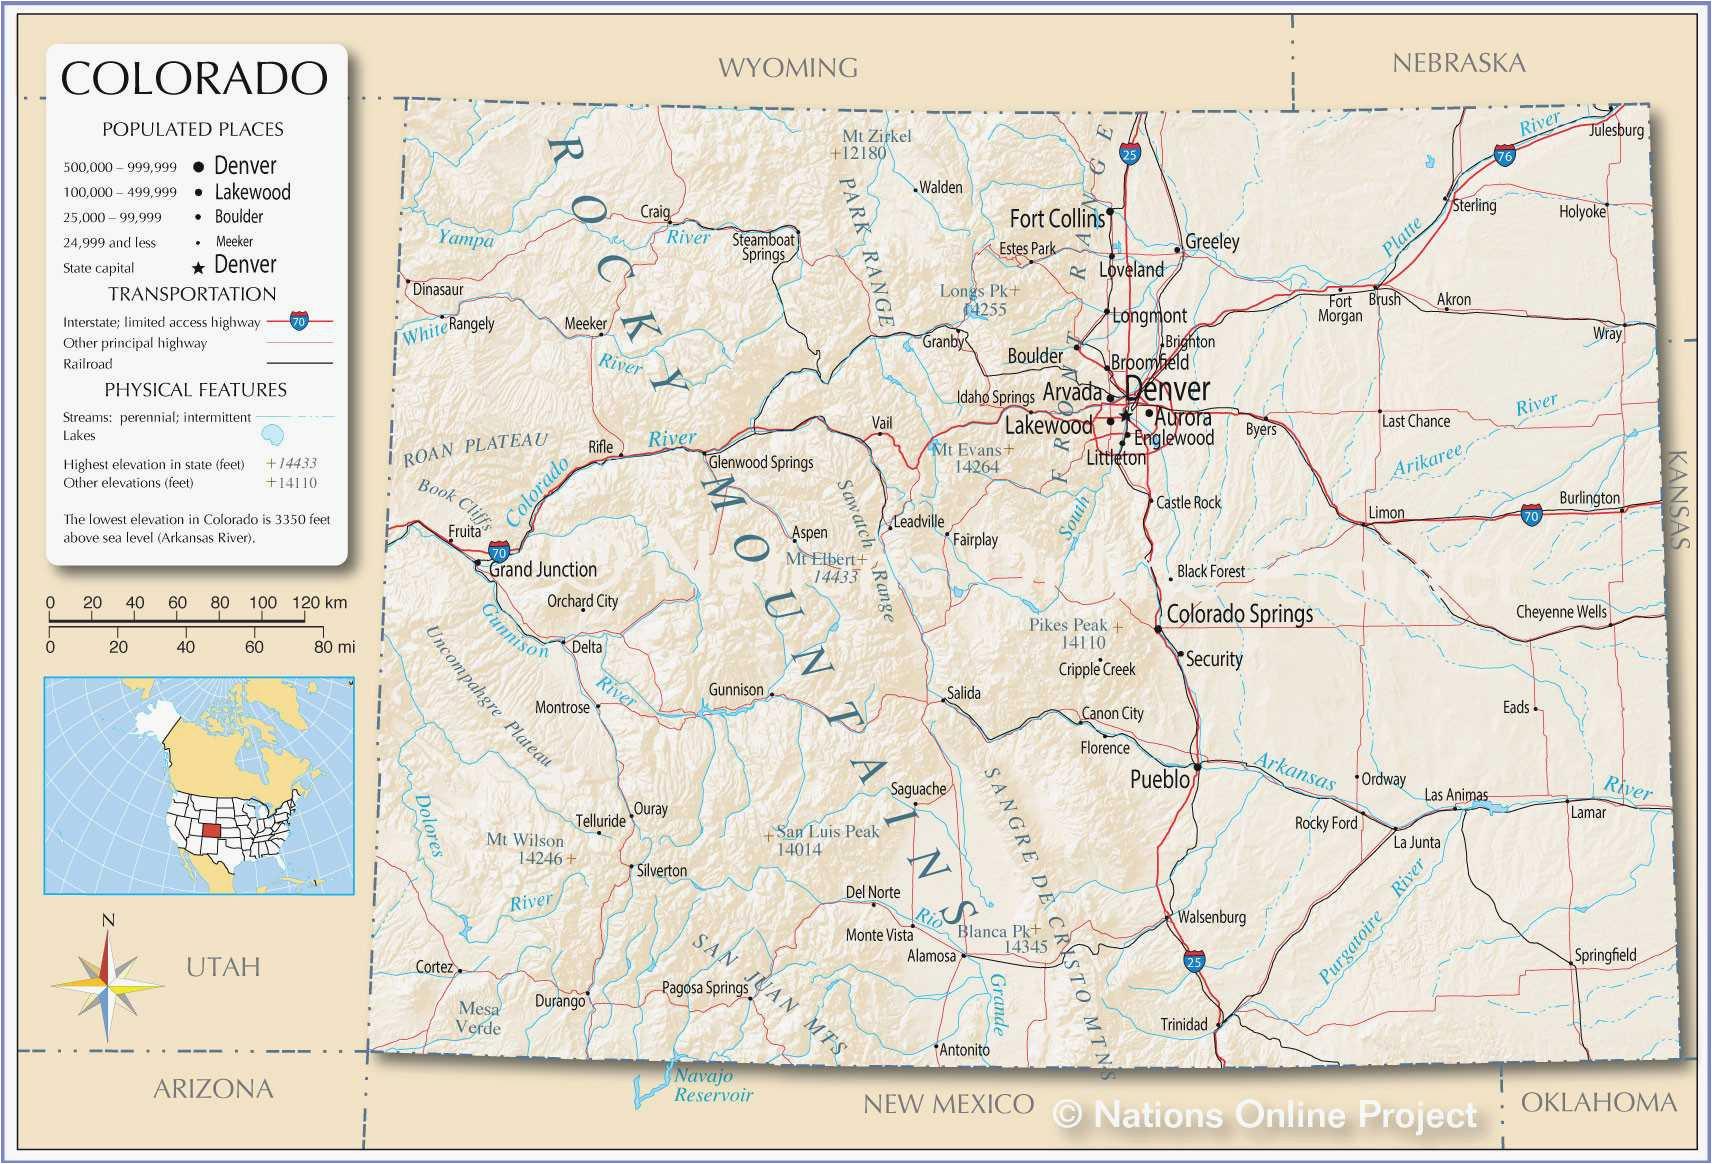 Google Maps Michigan Counties Michigan Map with Cities and ... on google pi, google id, google death, google ho, google pr, google internet explorer, google de, google fa, google cr, google chrome,